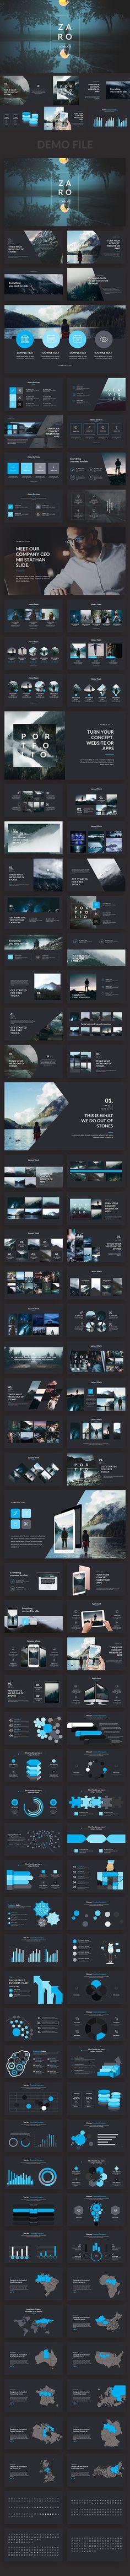 Zaro Premium Keynote Template - Creative Keynote Templates